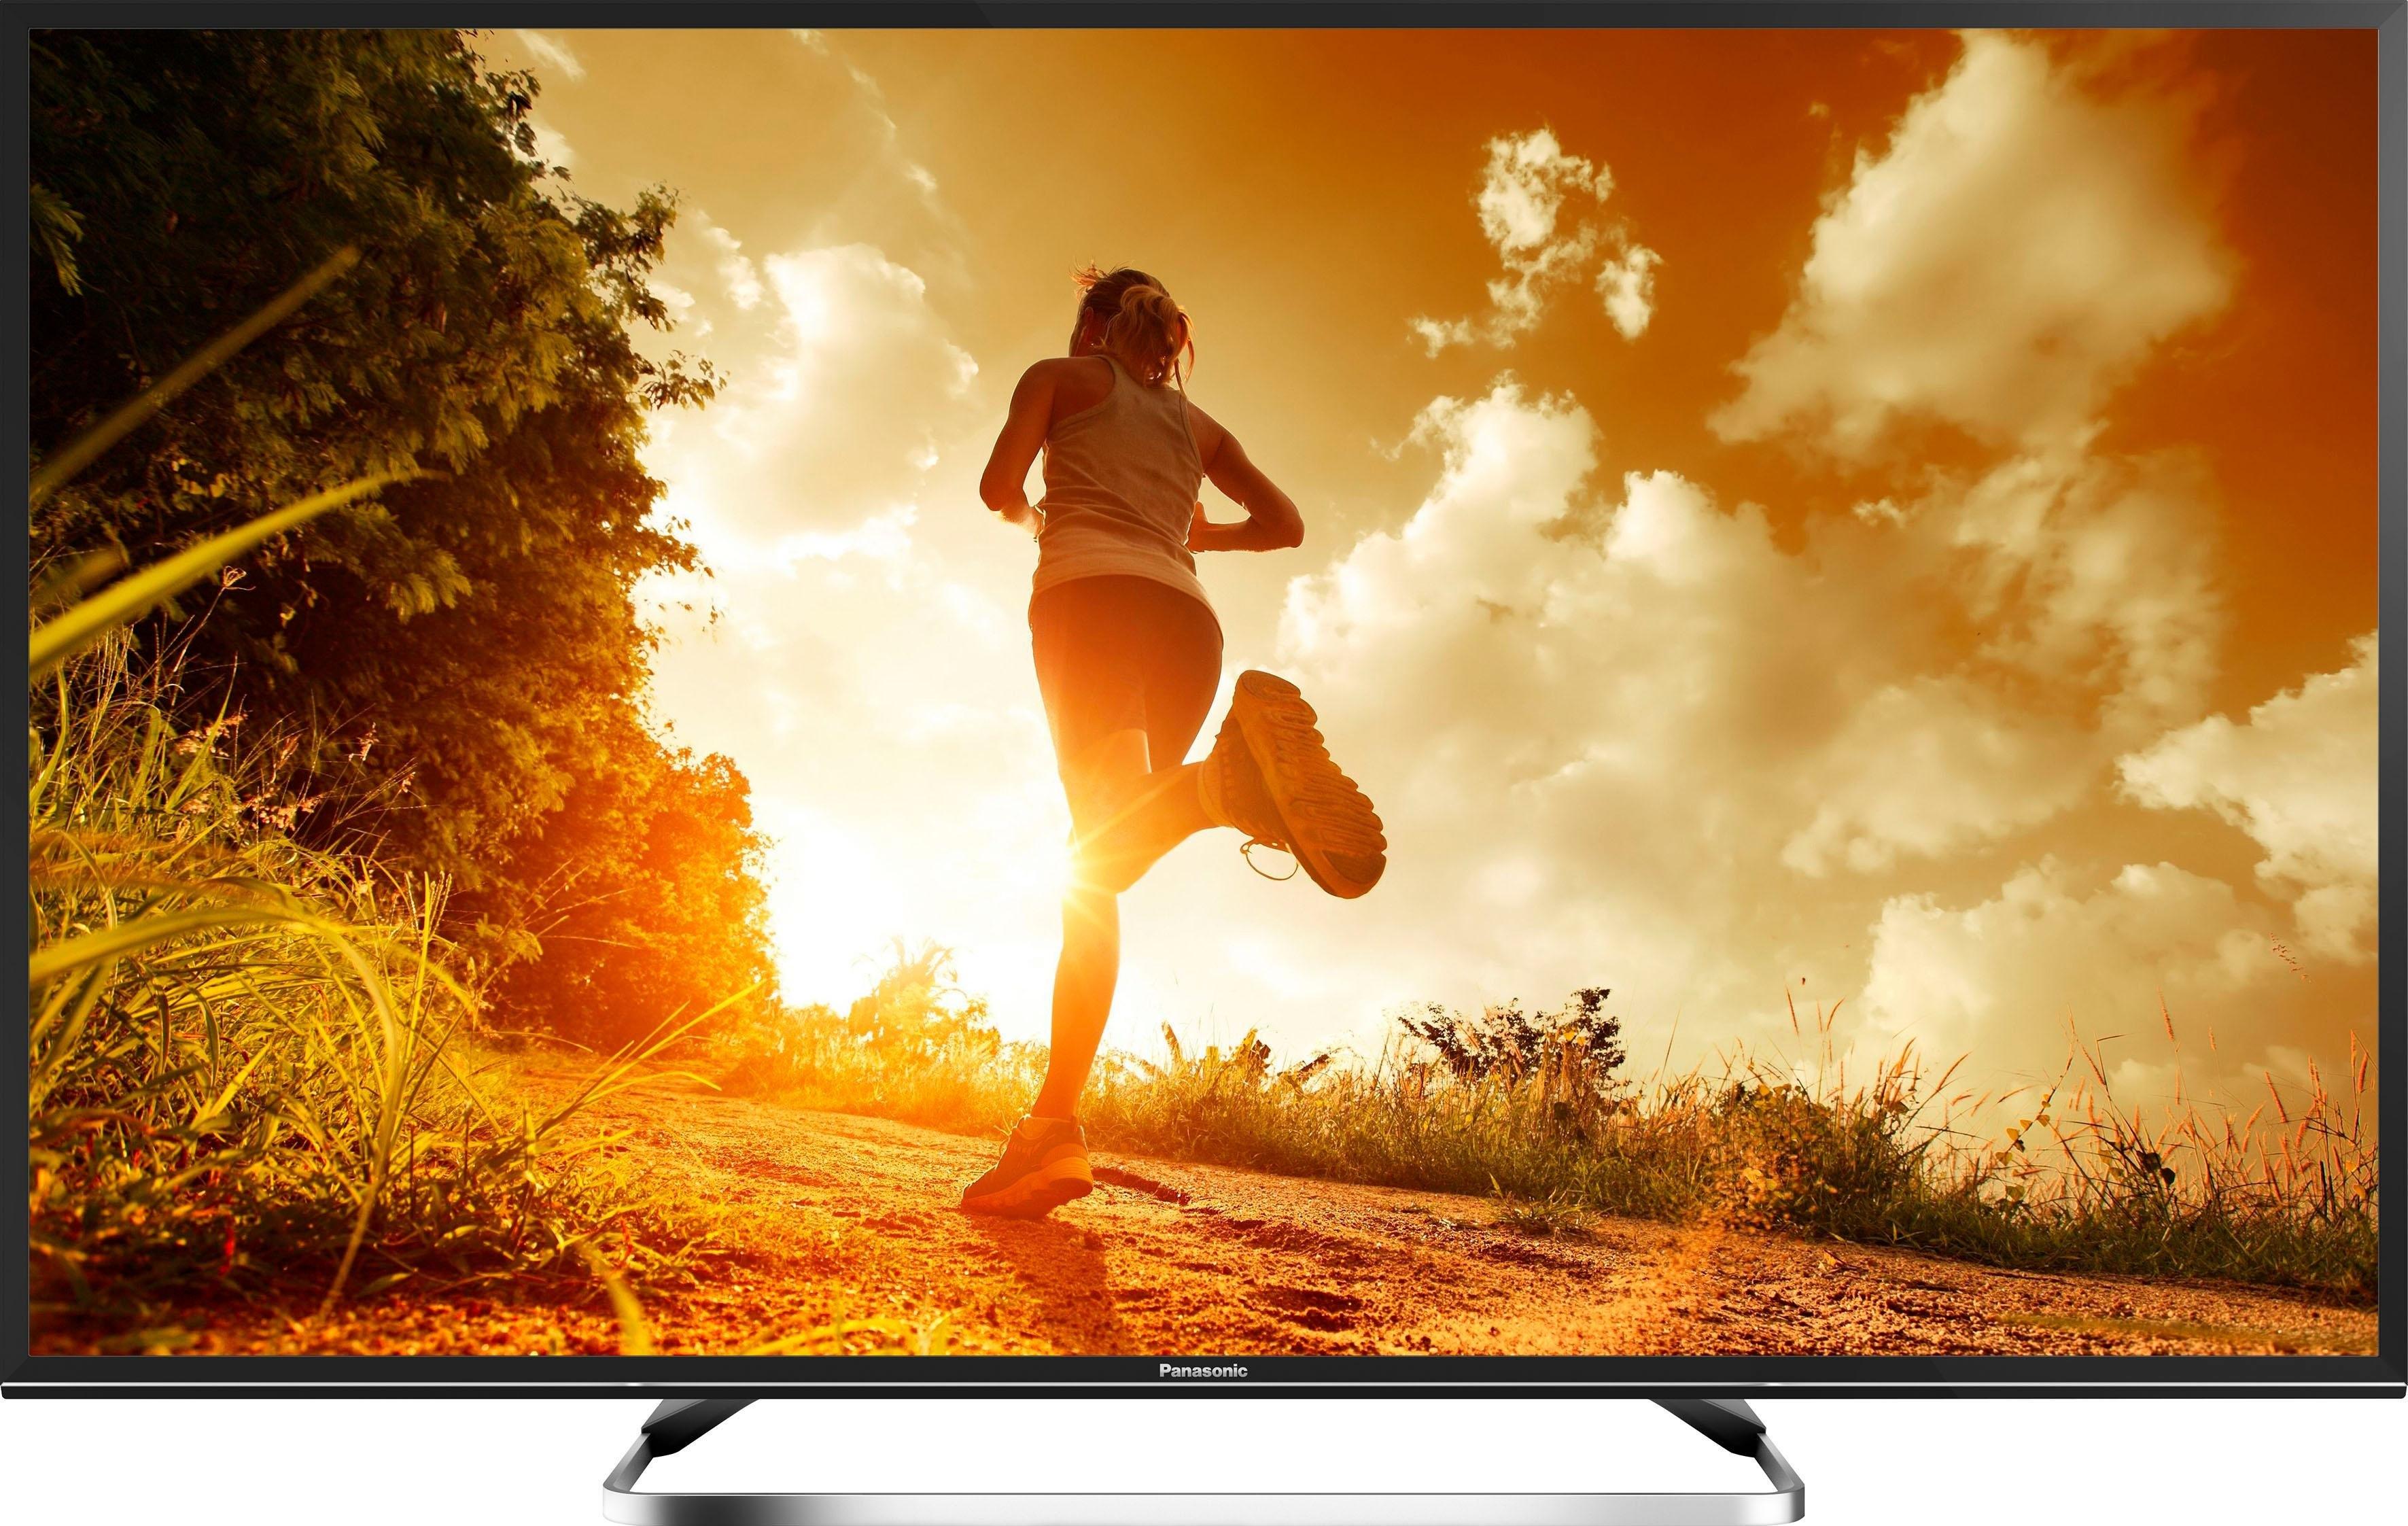 Panasonic TX-40FSW504 led-tv (40 inch), Full HD, smart-tv nu online bestellen